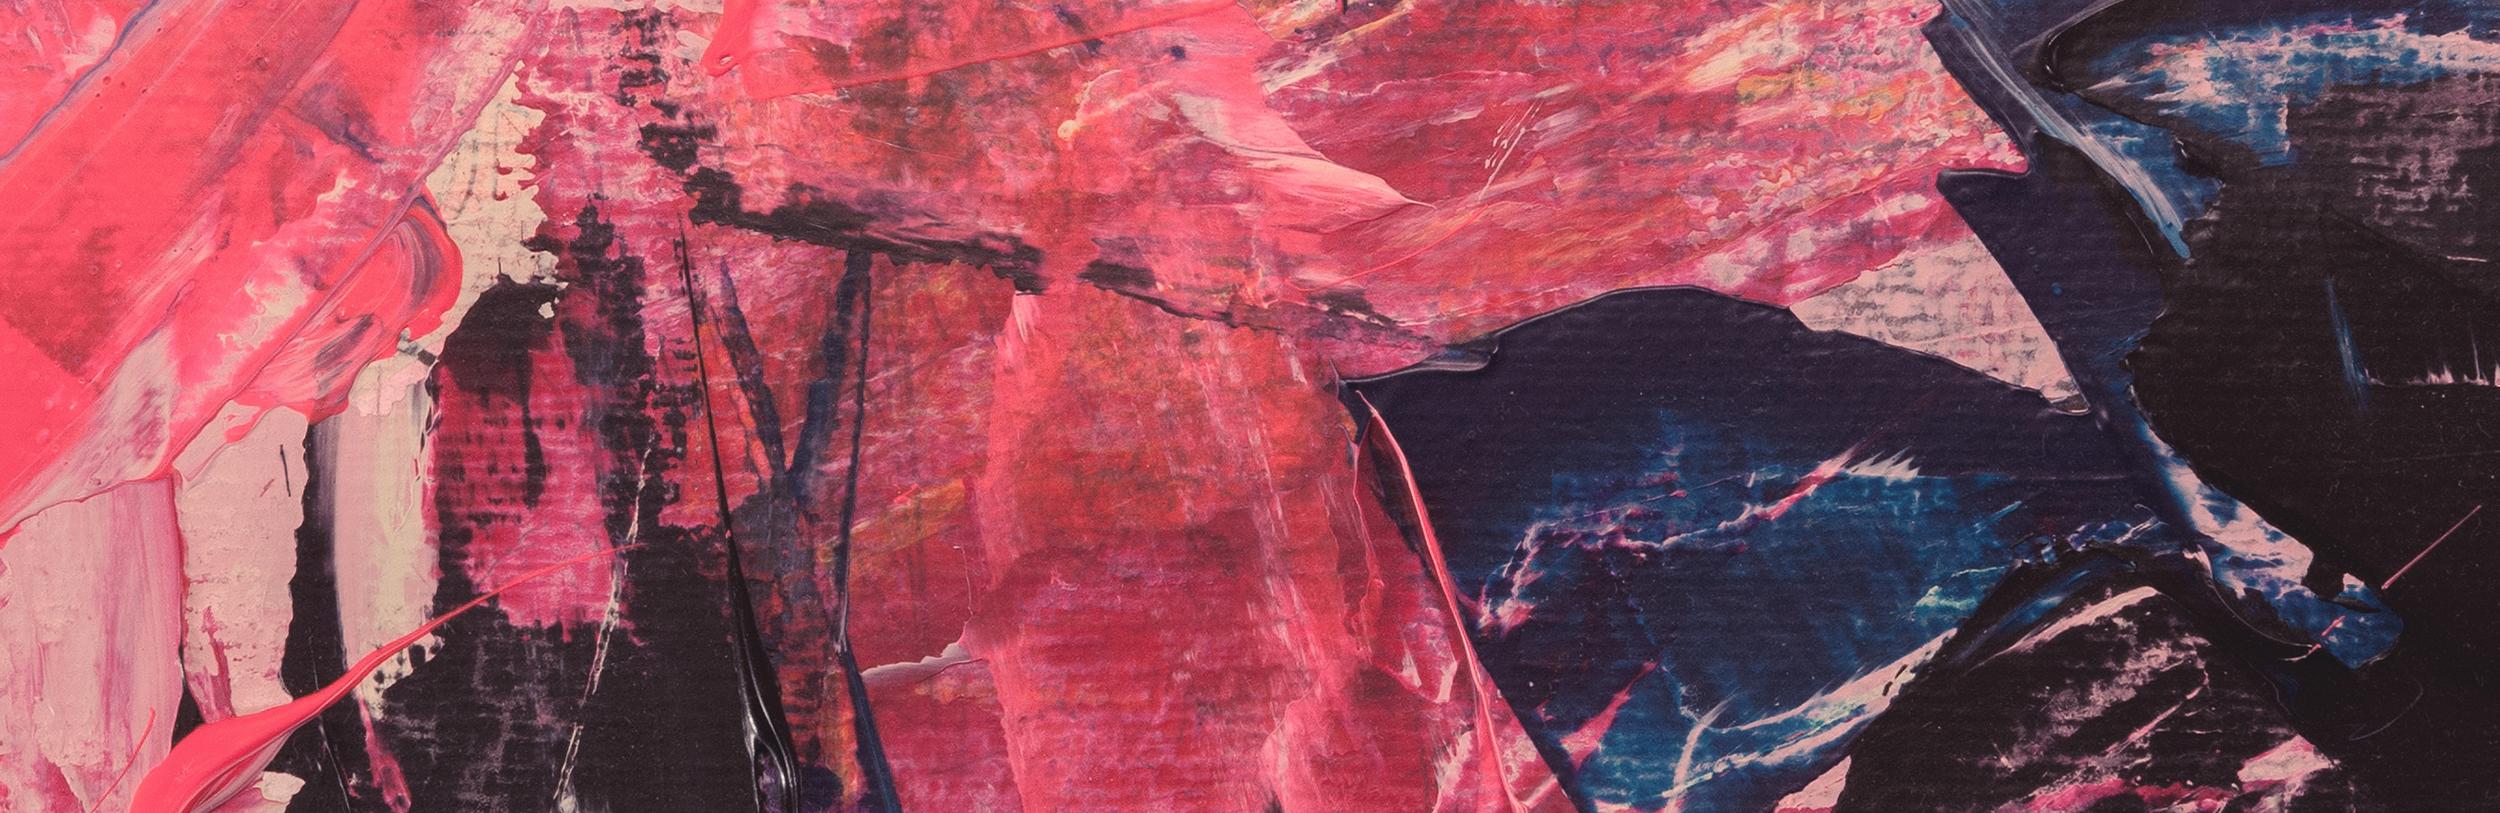 bonjourmolotov Serenata Illustration Ilustracao painting pintura acrylic acrílico canvas tela paper cardboard mdf Andre Gigante 01N2.jpg